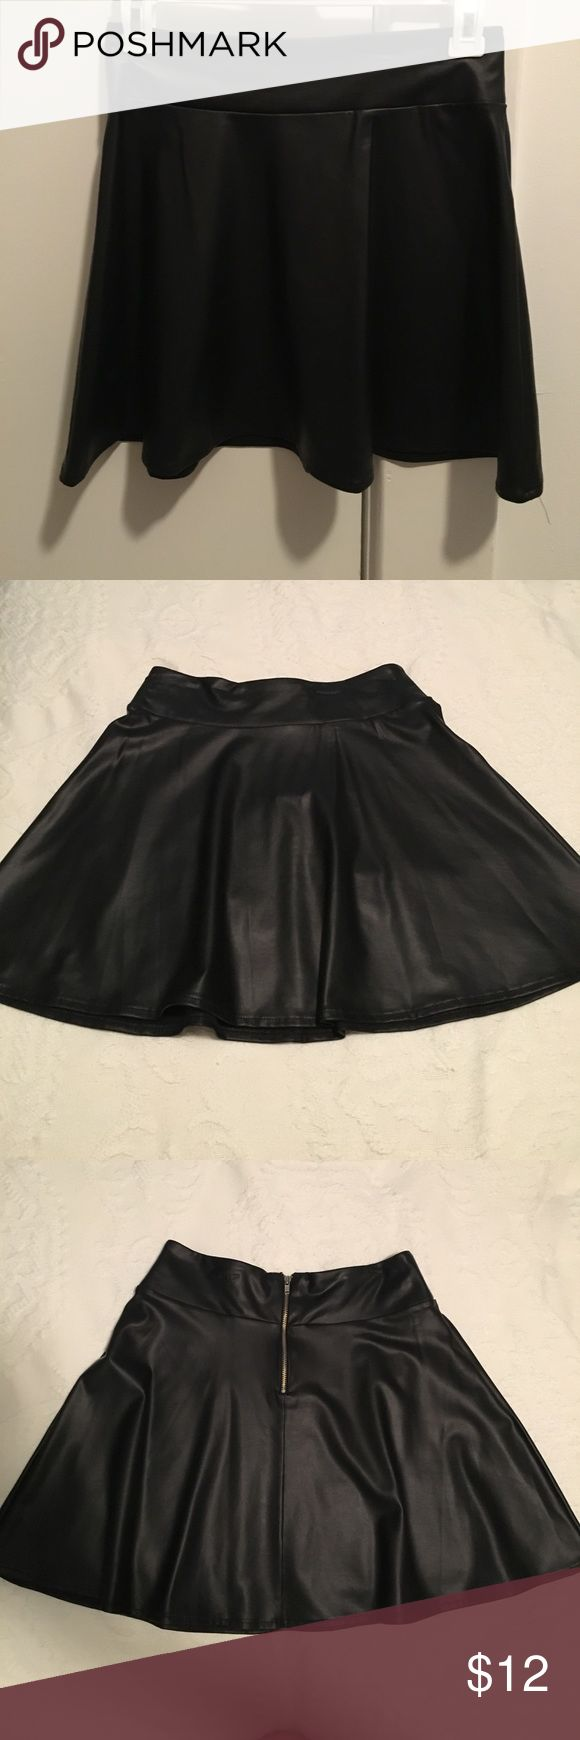 Black faux leather skater skirt Black faux leather skater skirt from forever 21. Good used condition! Forever 21 Skirts Circle & Skater